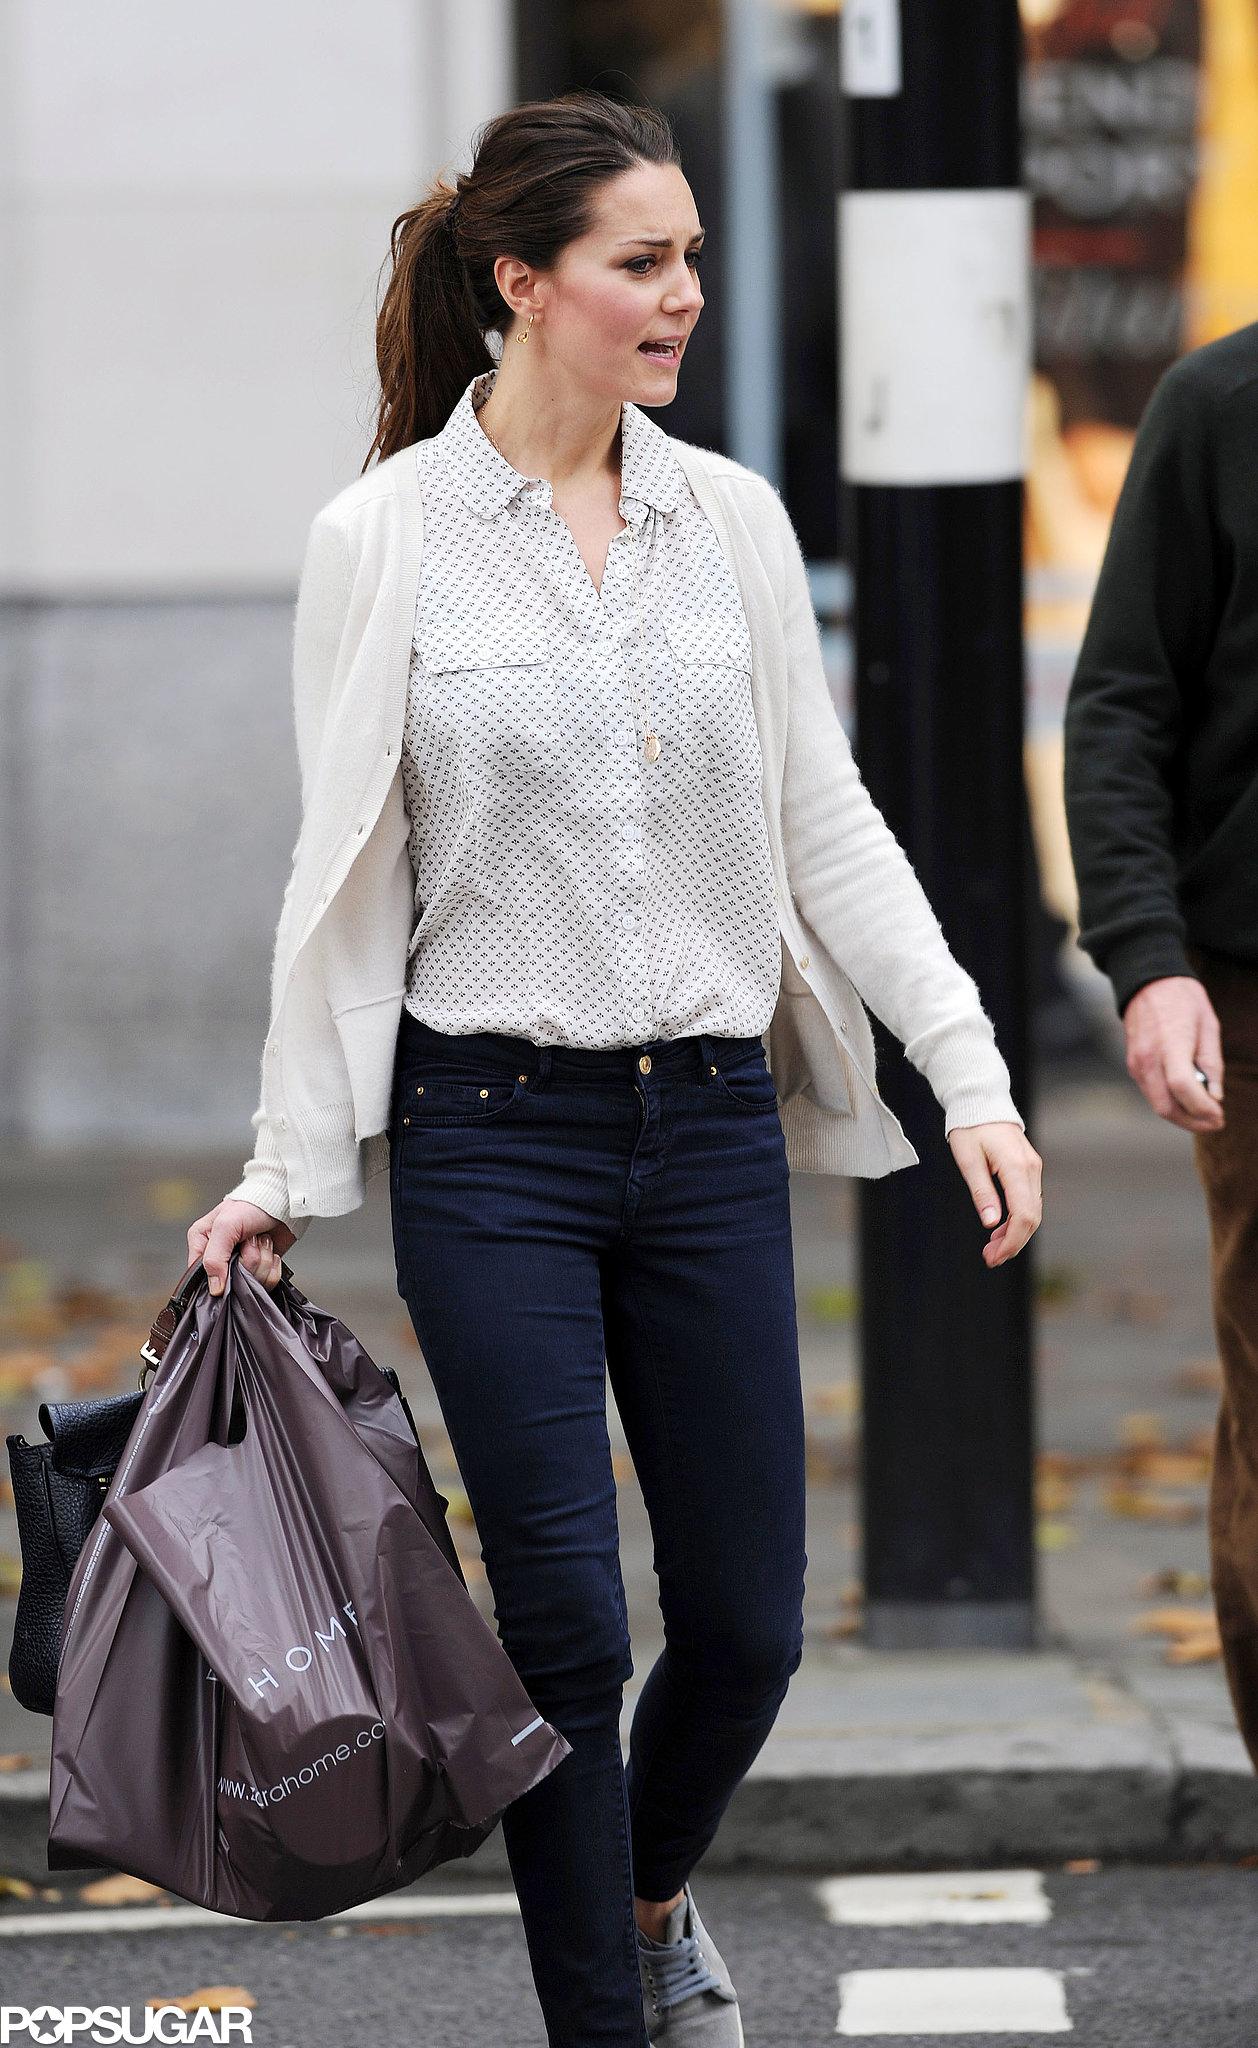 Kate Middleton went shopping on Kings Road in London.